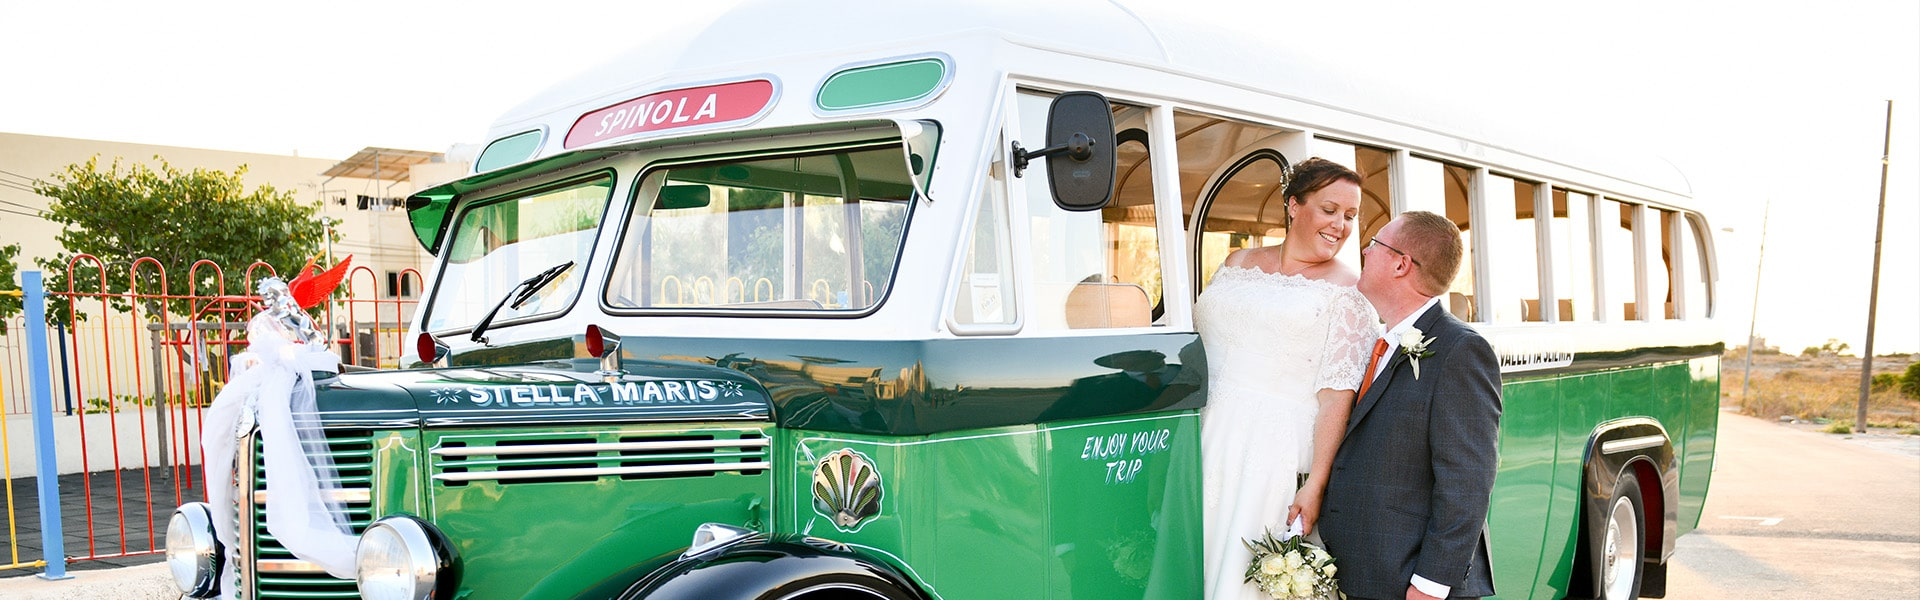 koptaco coaches cooperative malta vintage bus wedding